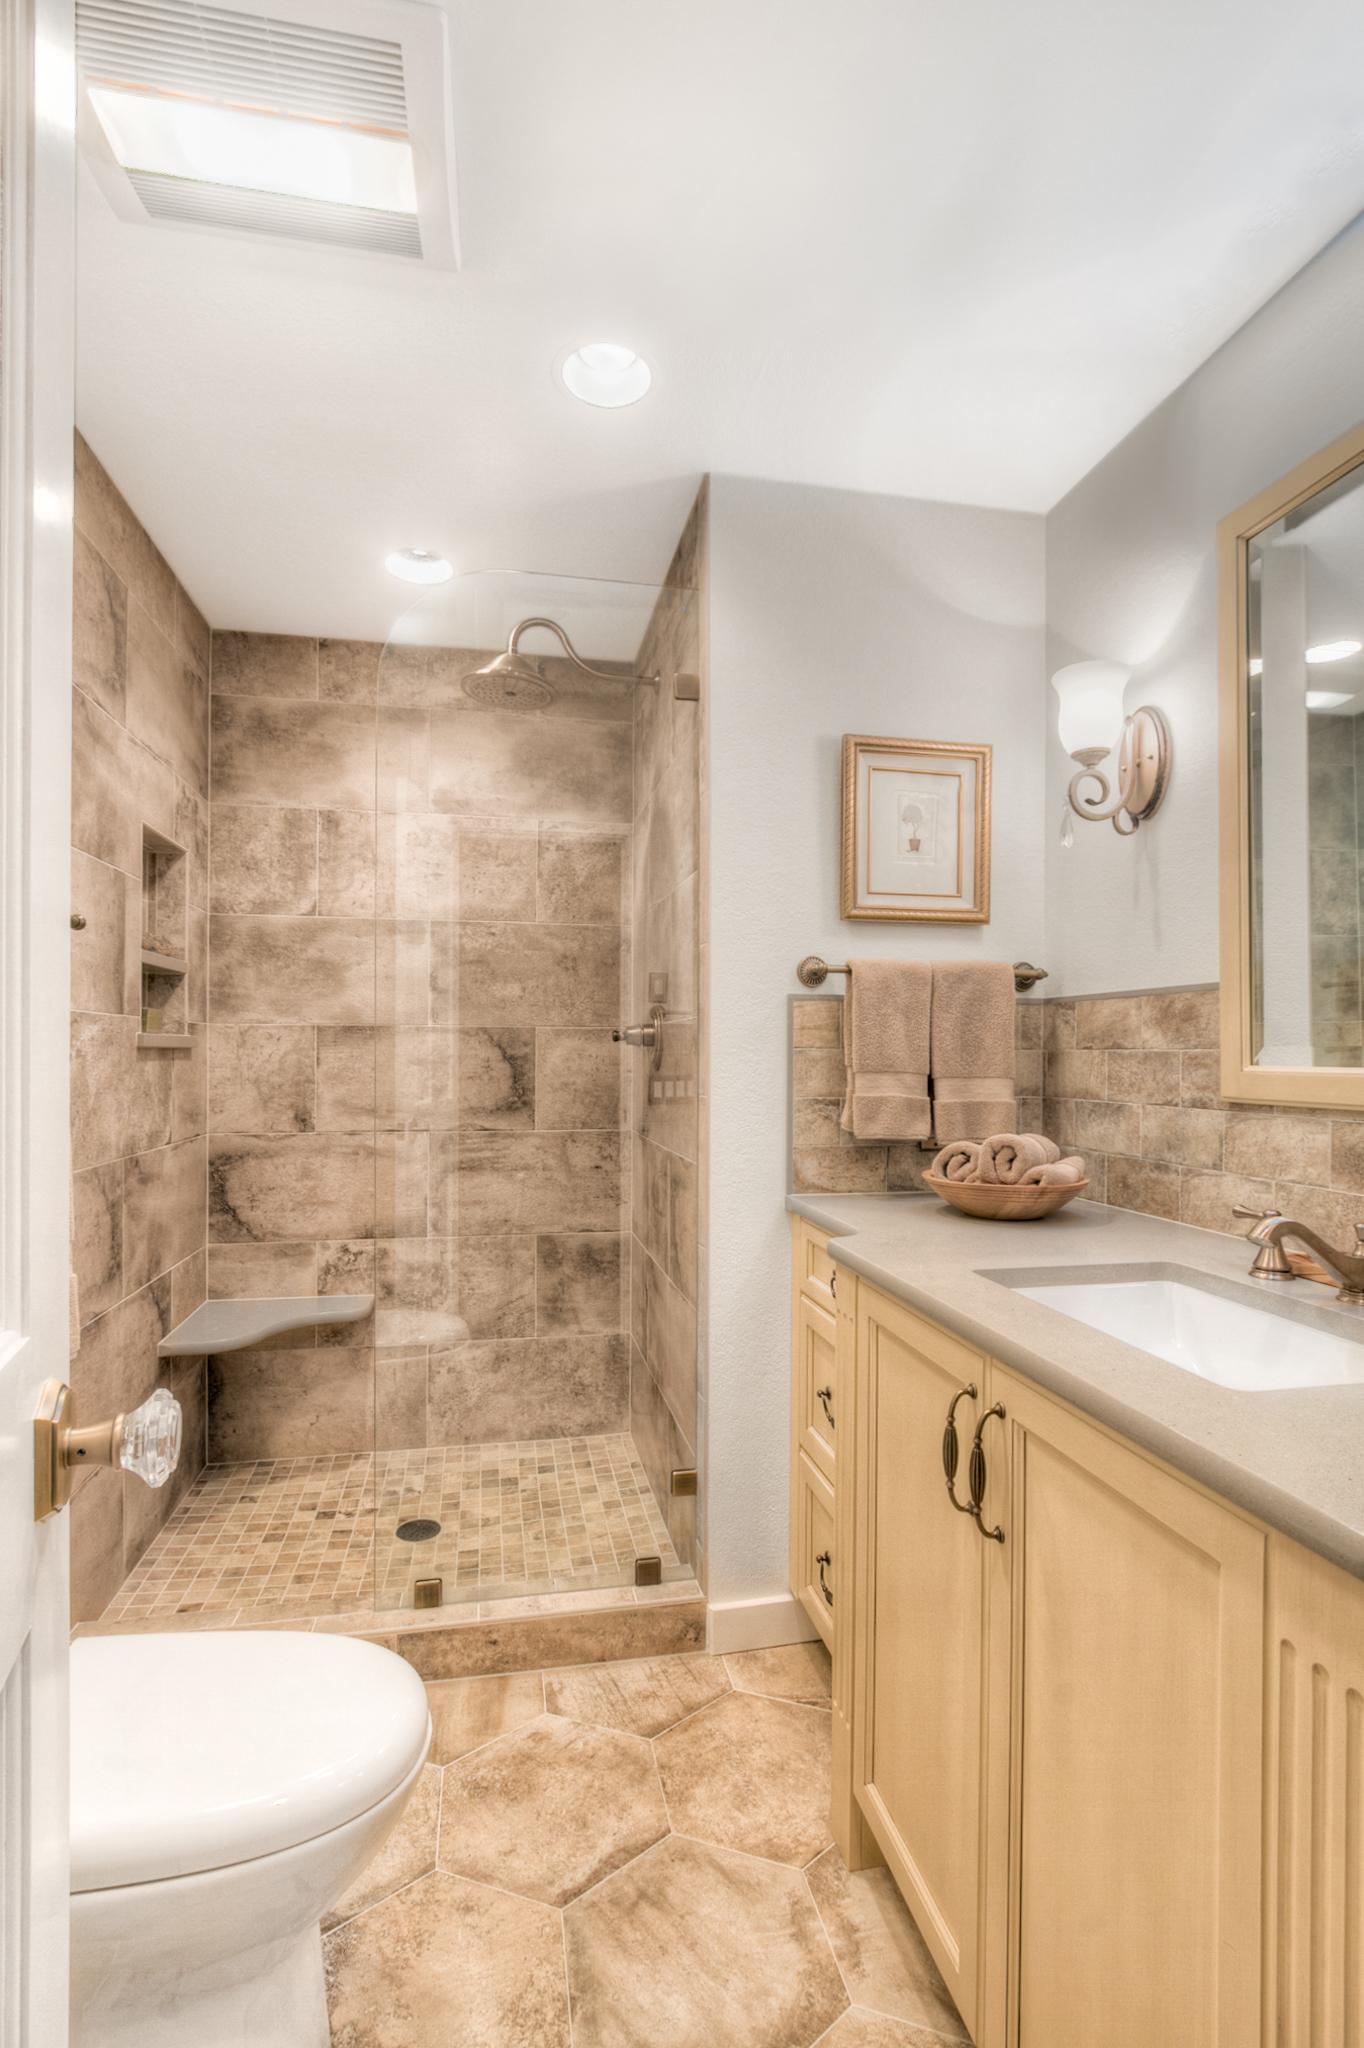 Guest Bath Overview